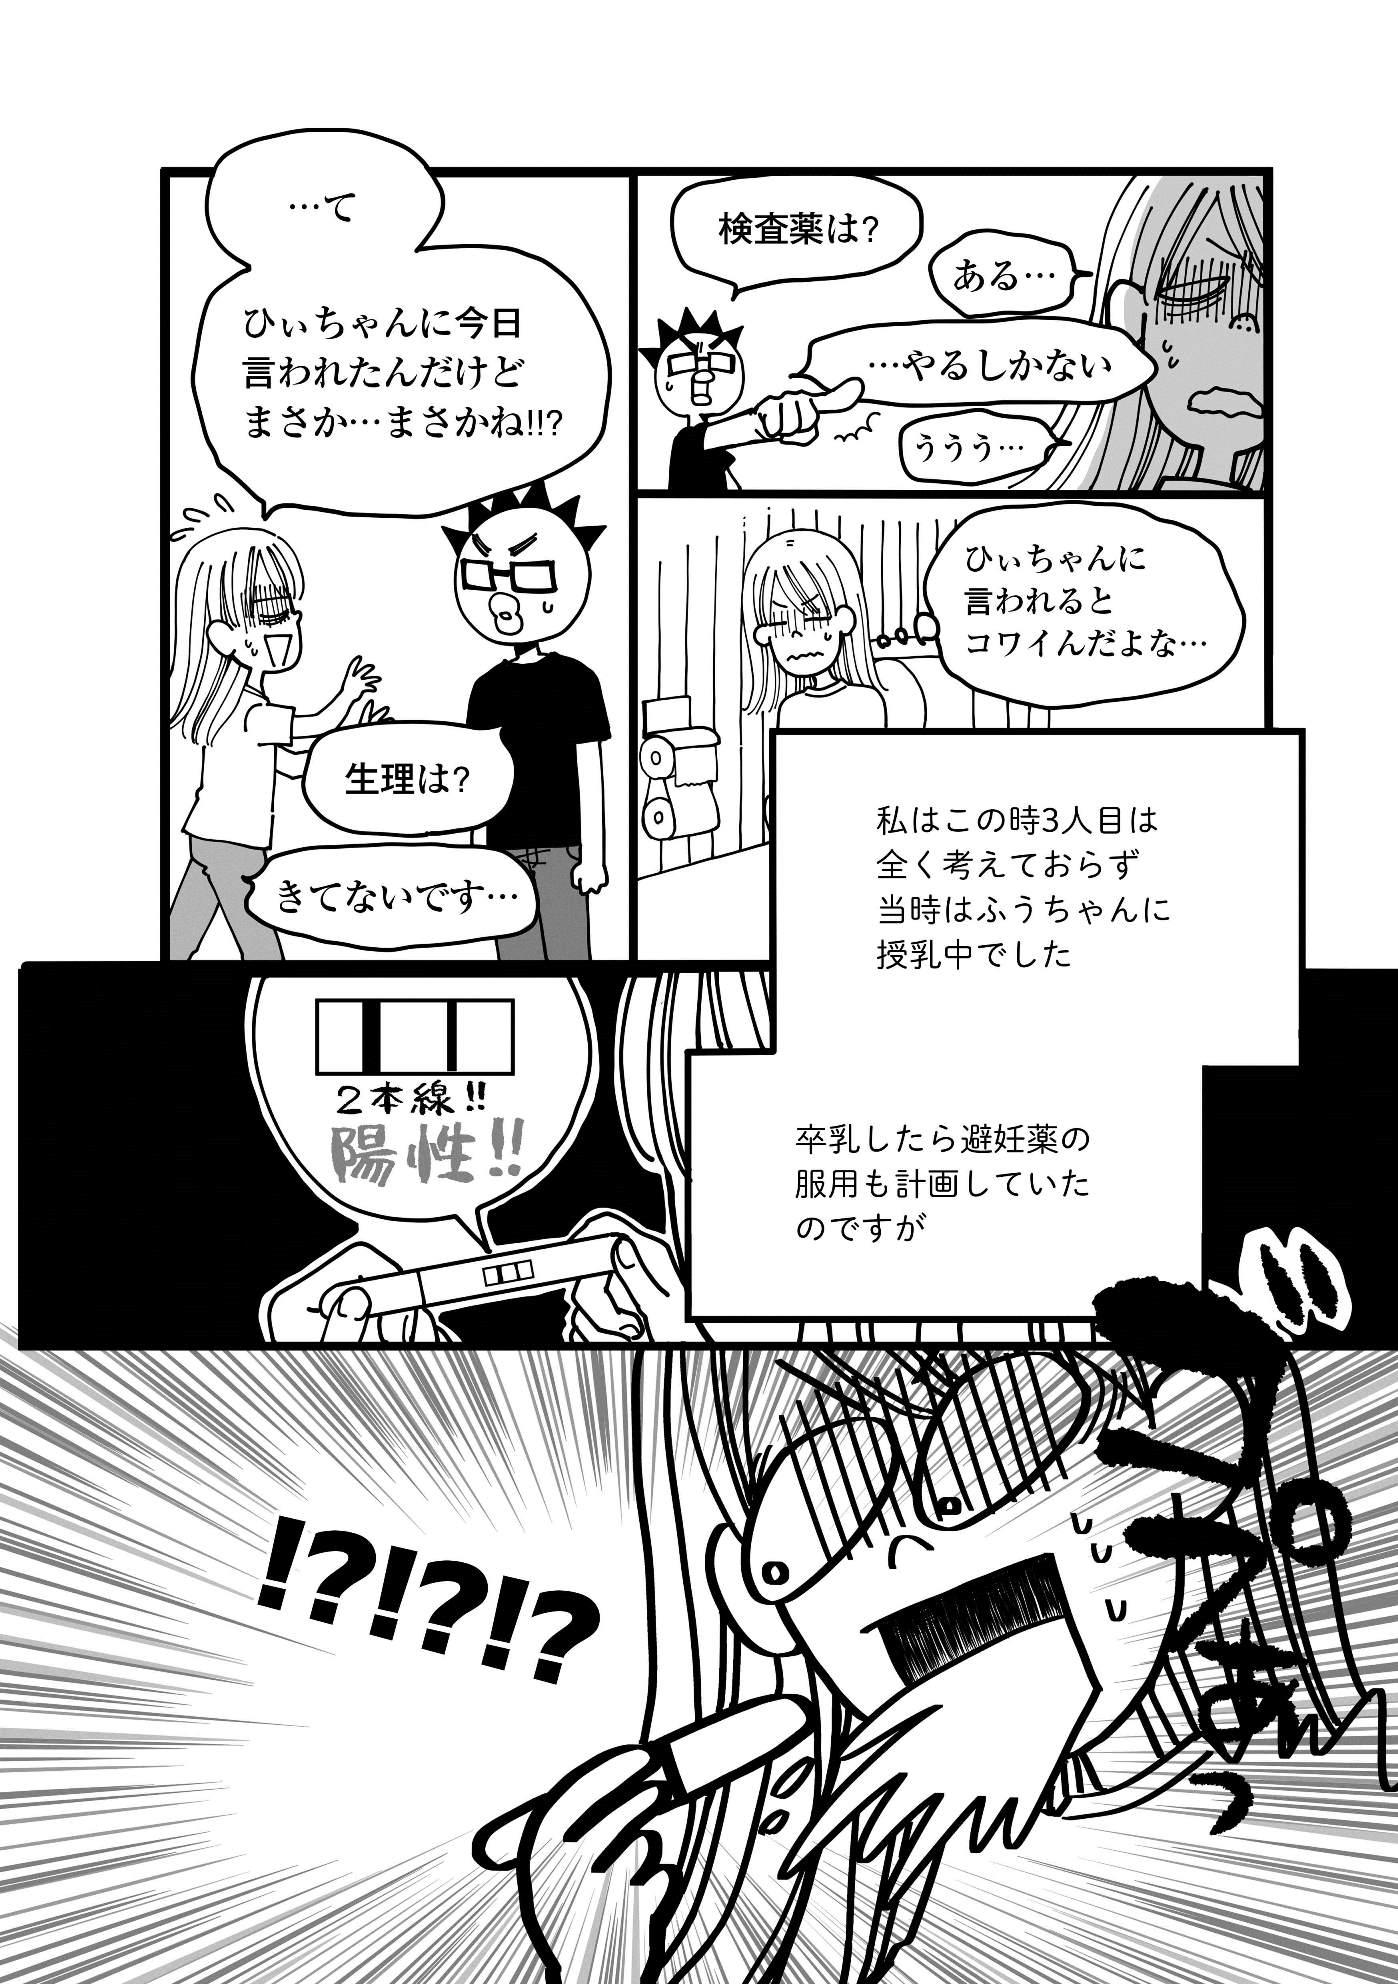 20200720osoranohanashi_sub3.jpg